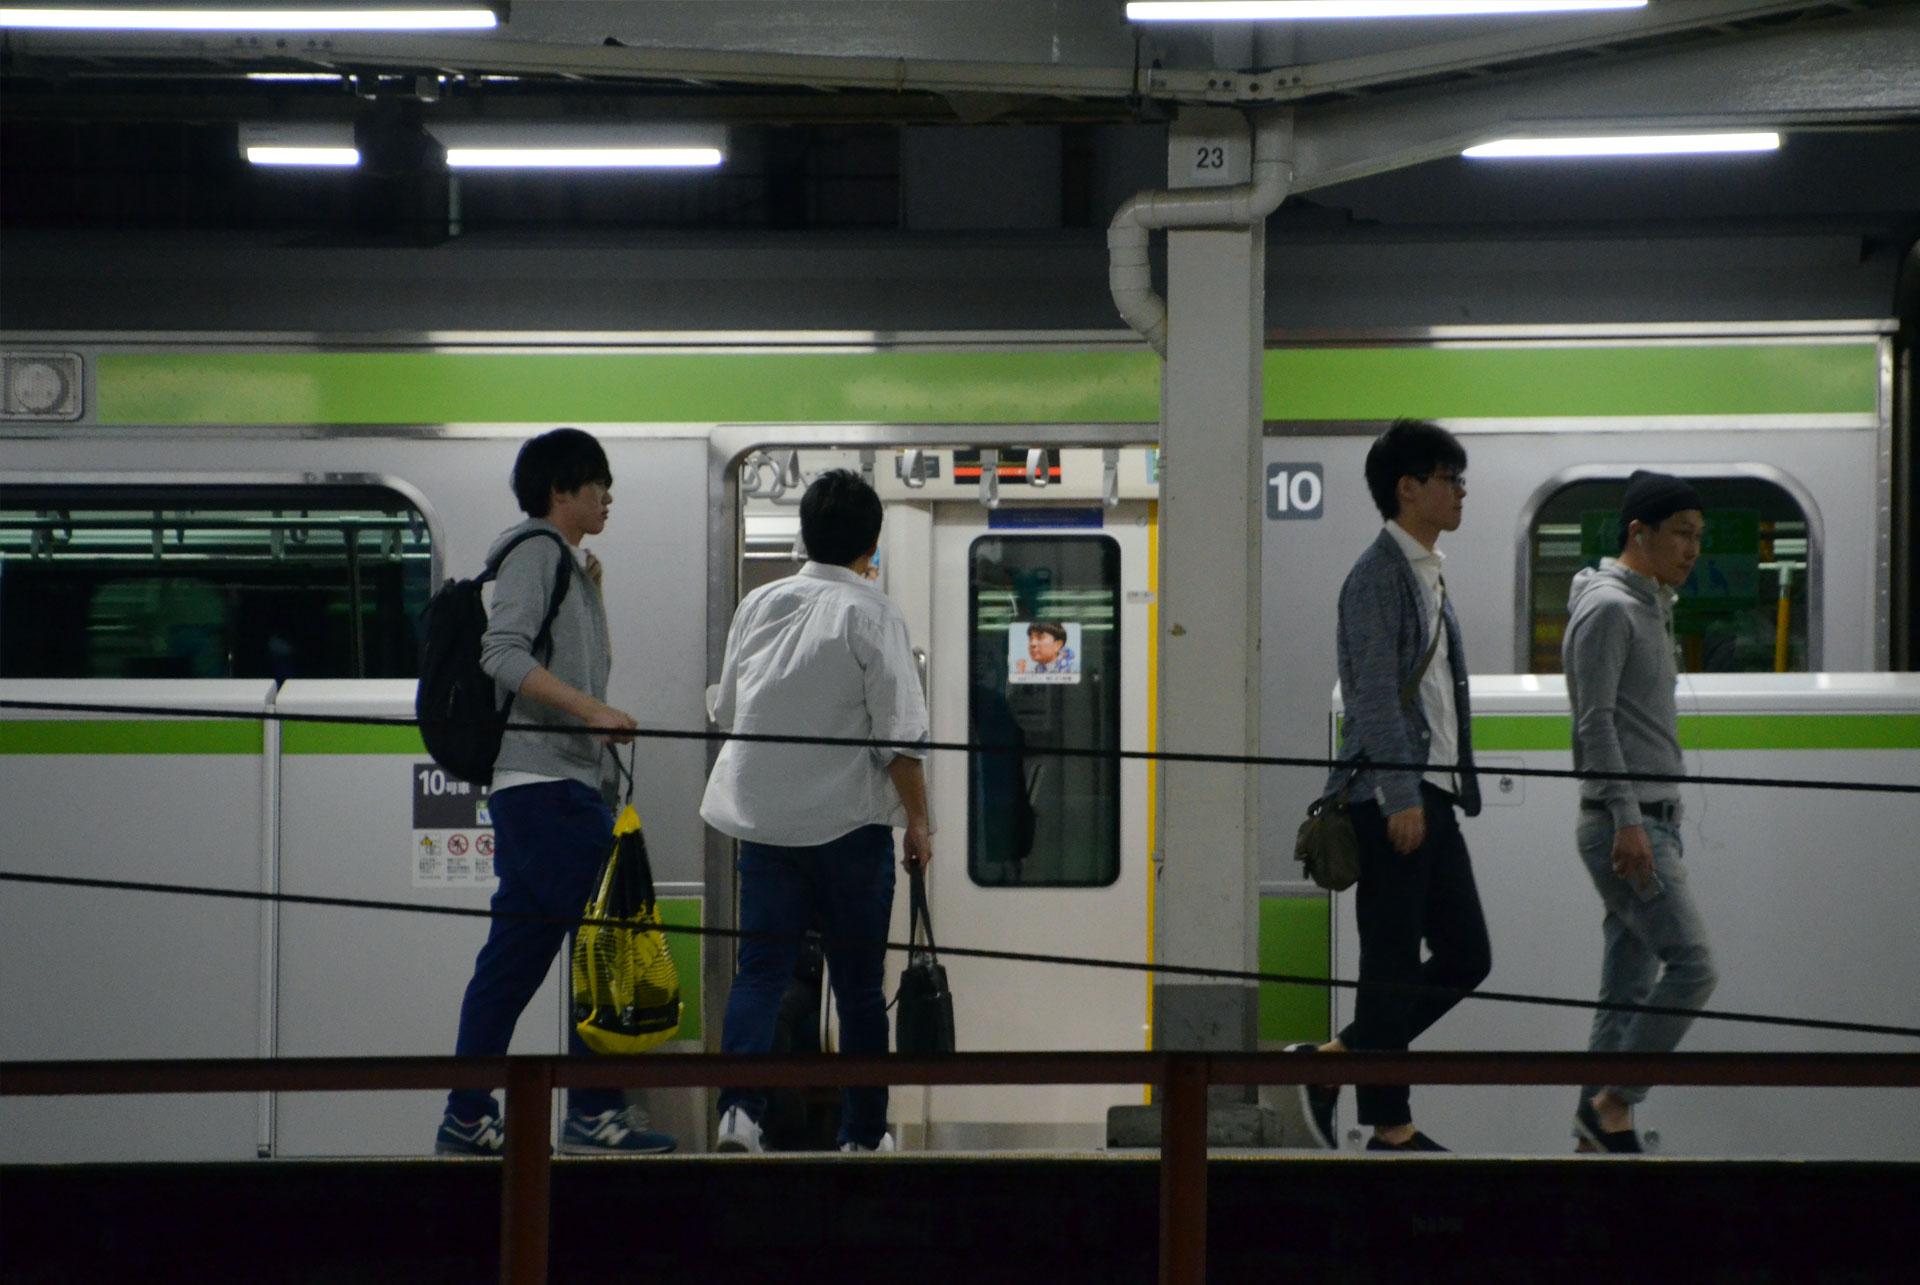 Akihabara station in Tokyo